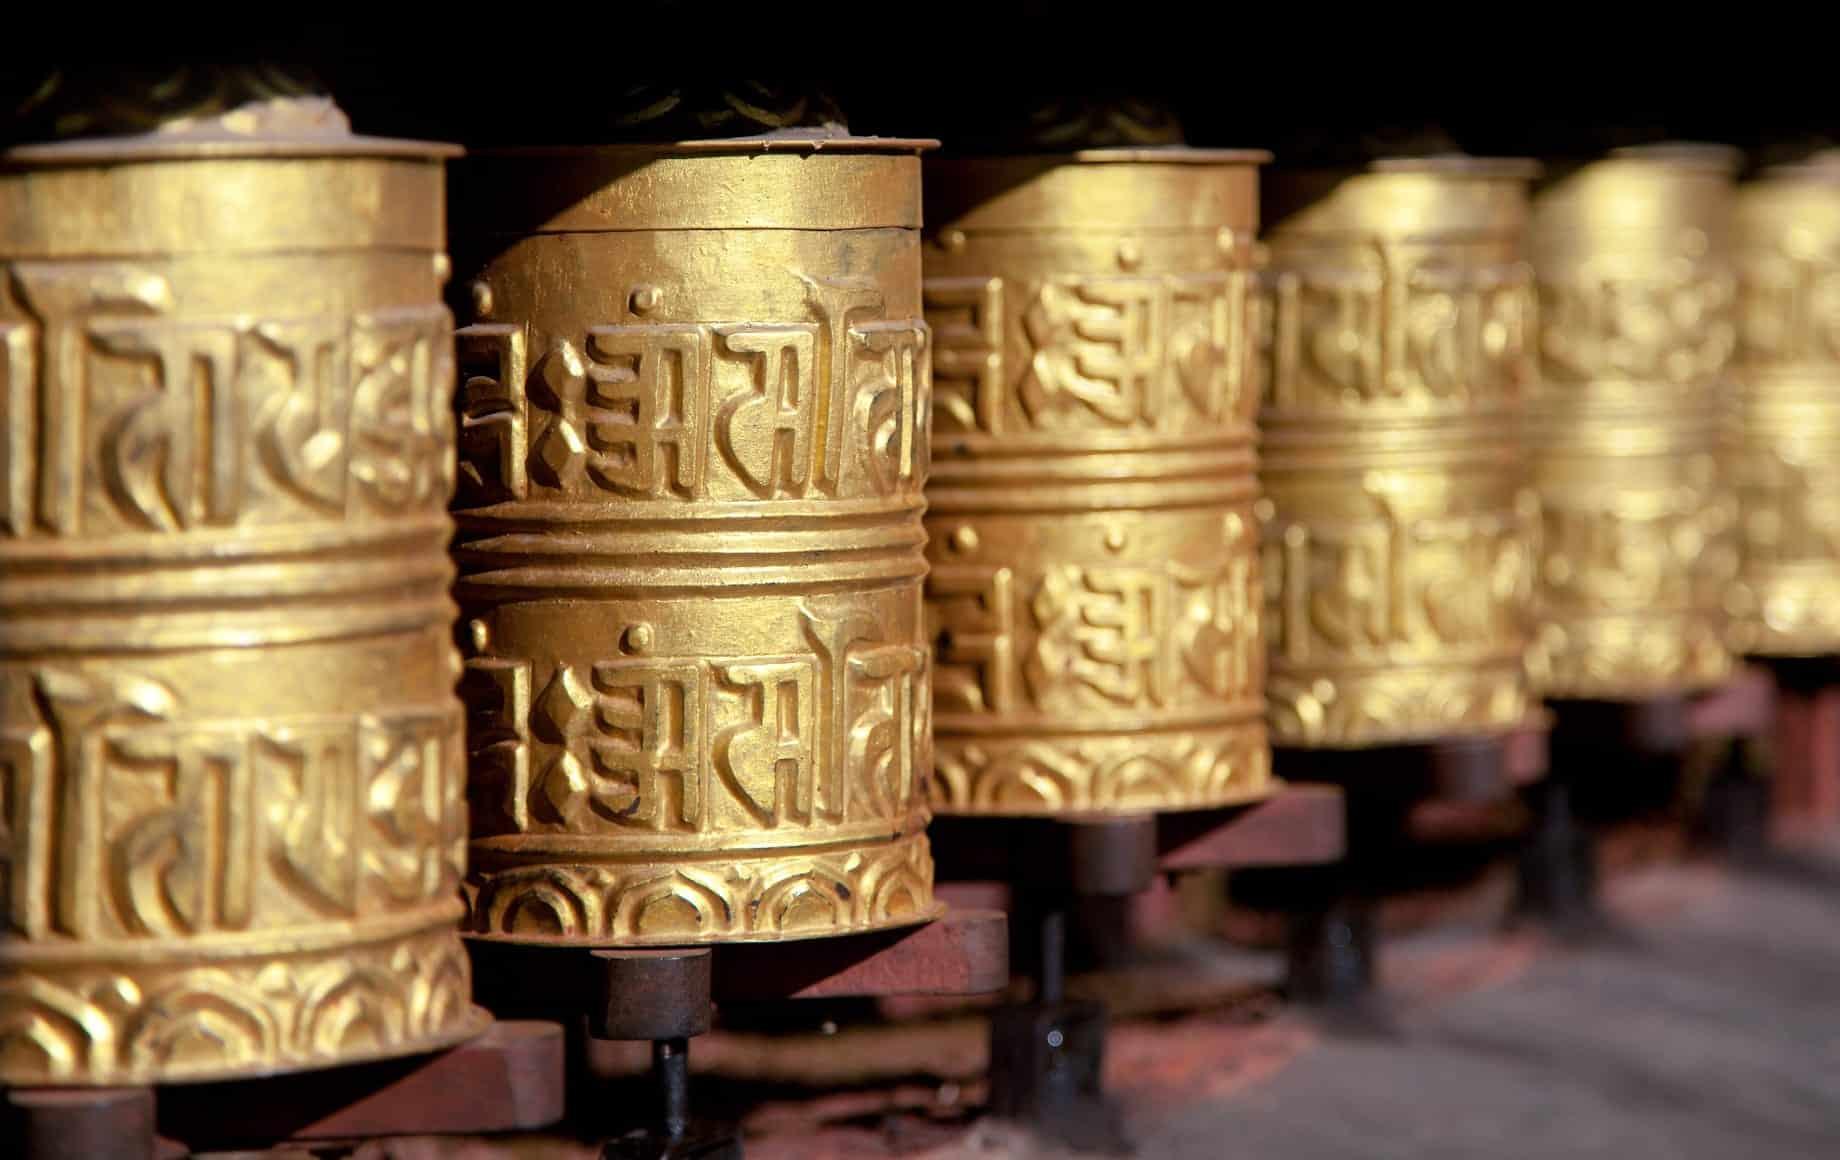 Bhutan traditional alphabets